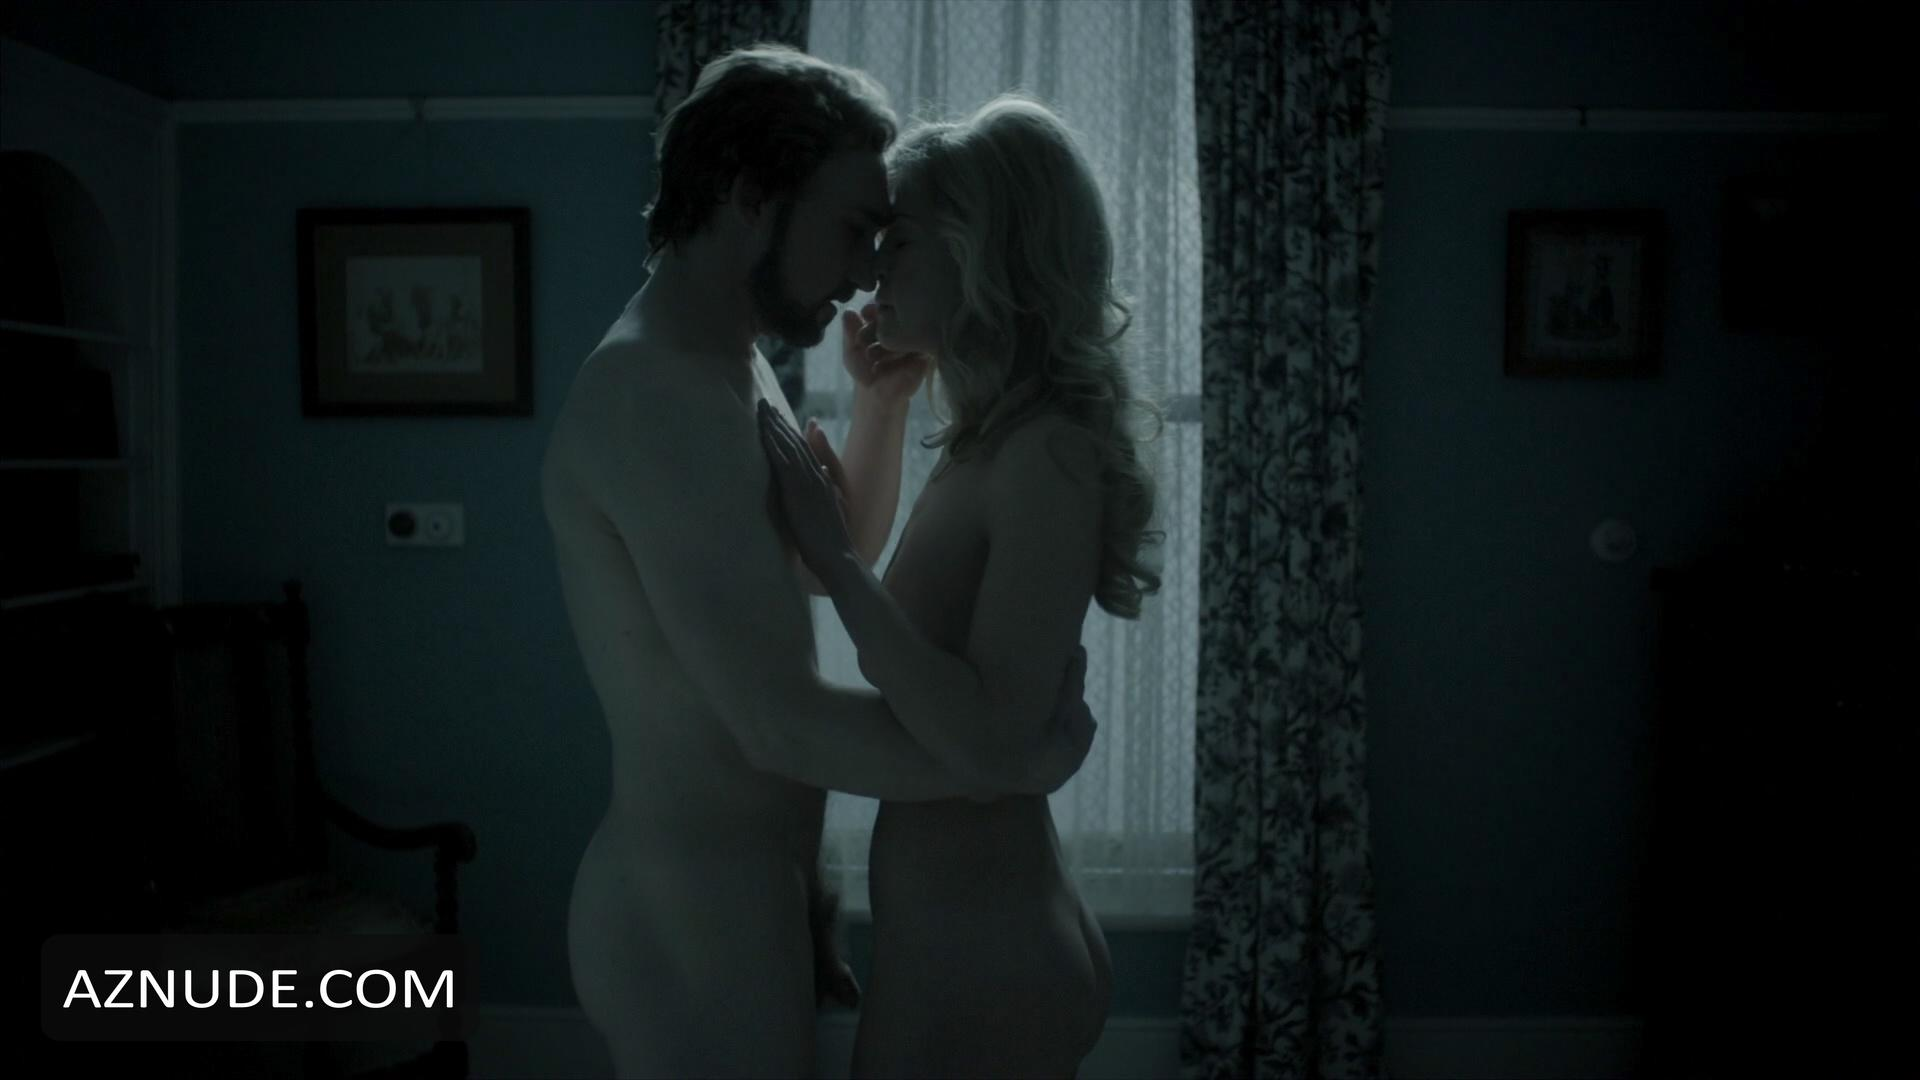 JOSEPH MAWLE Nude - AZNude Men